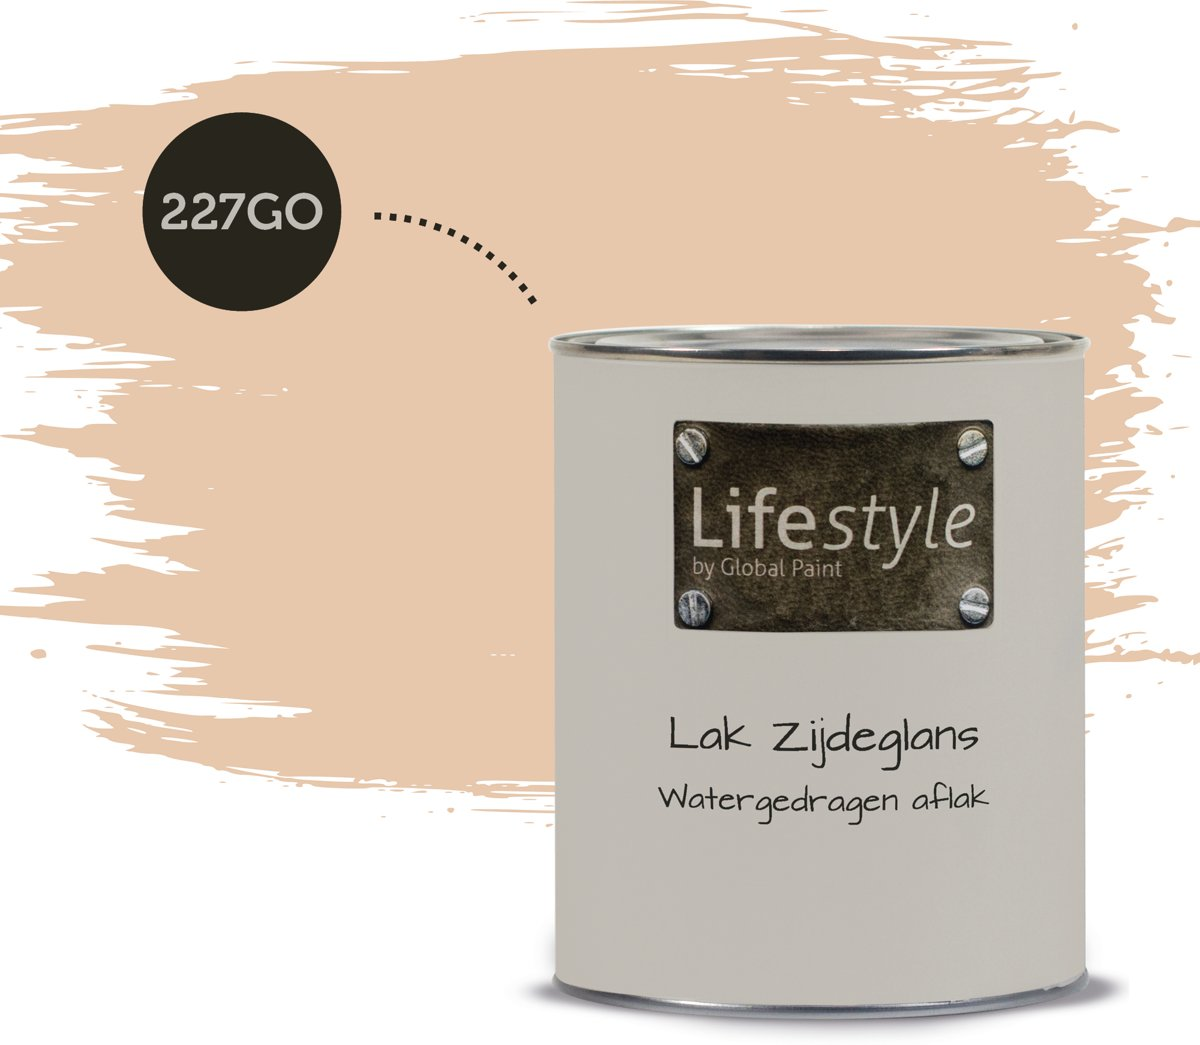 Lifestyle Lak Zijdeglans | 227GO | 0.5 liter